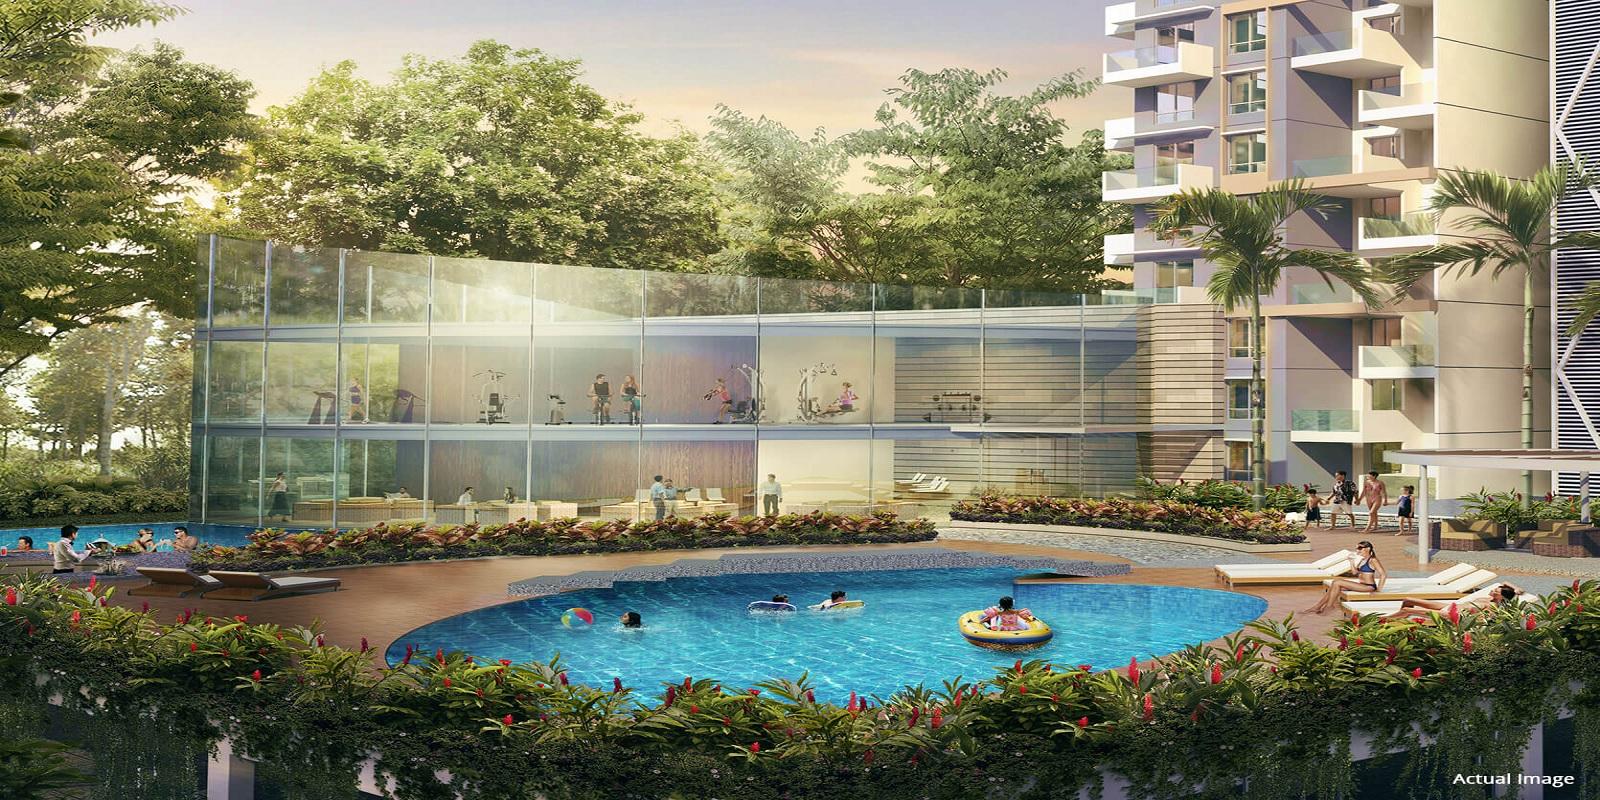 kolte patil 24k sereno amenities features4